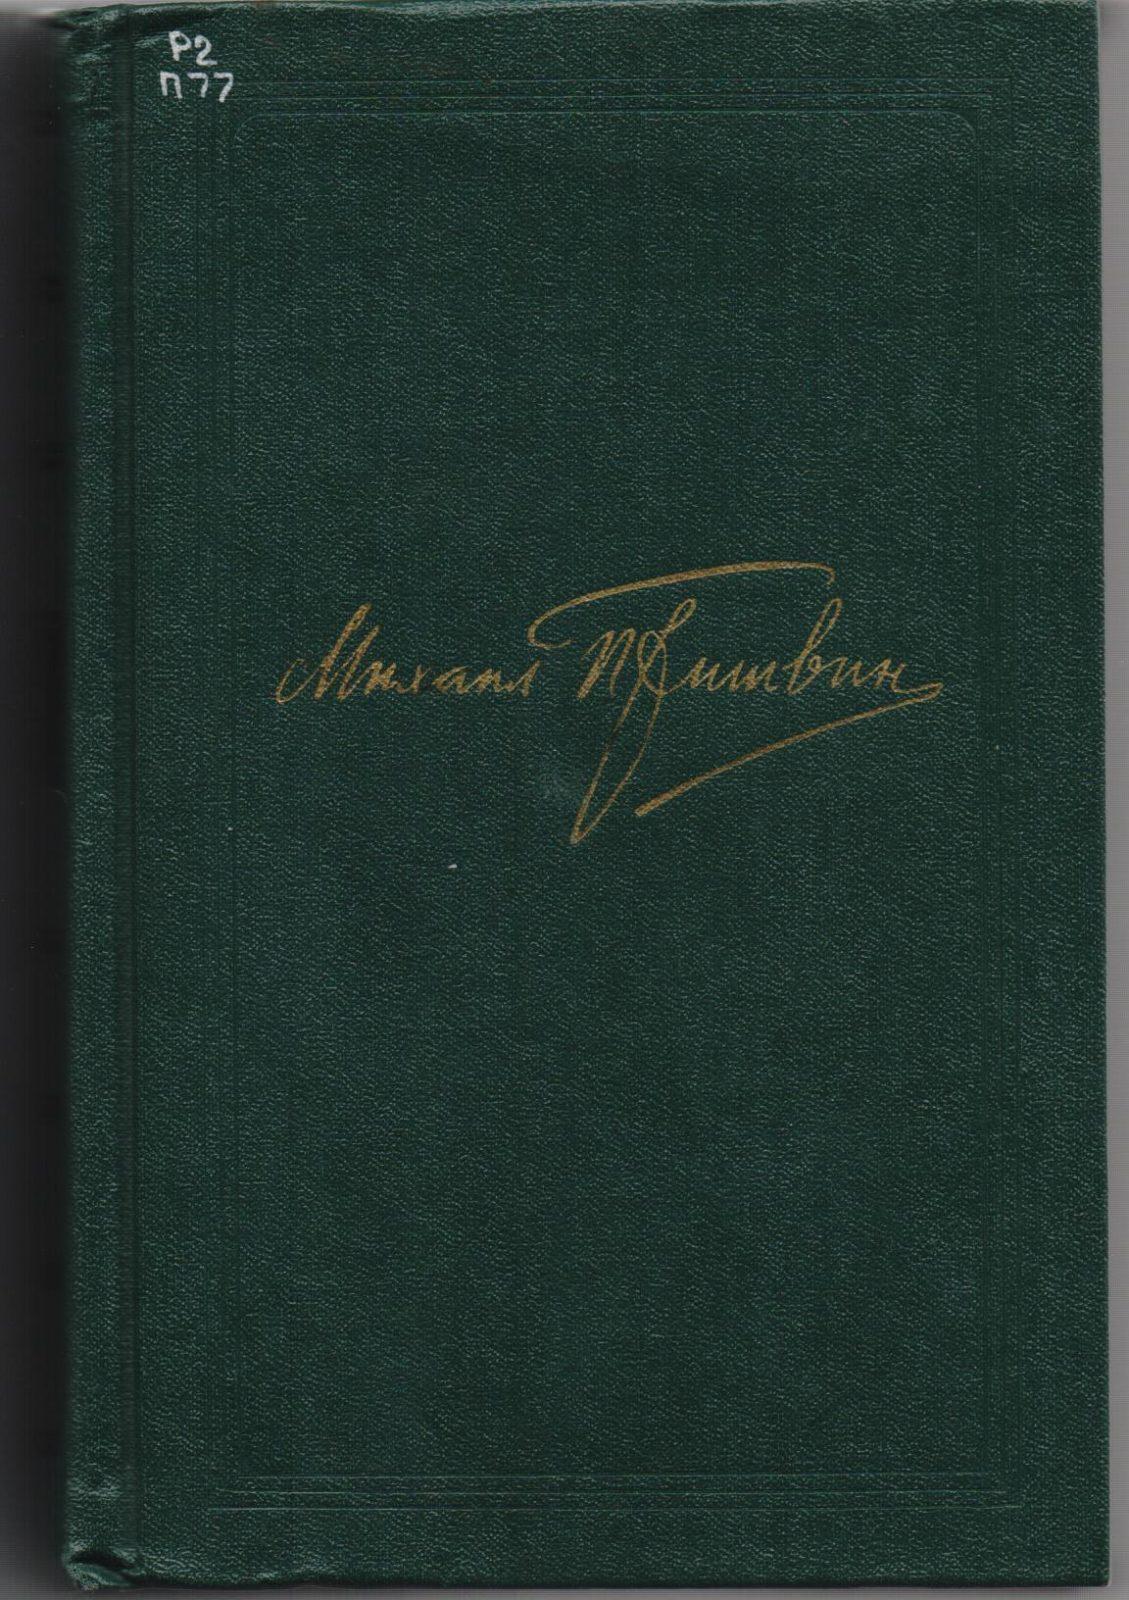 Дневники Пришвина